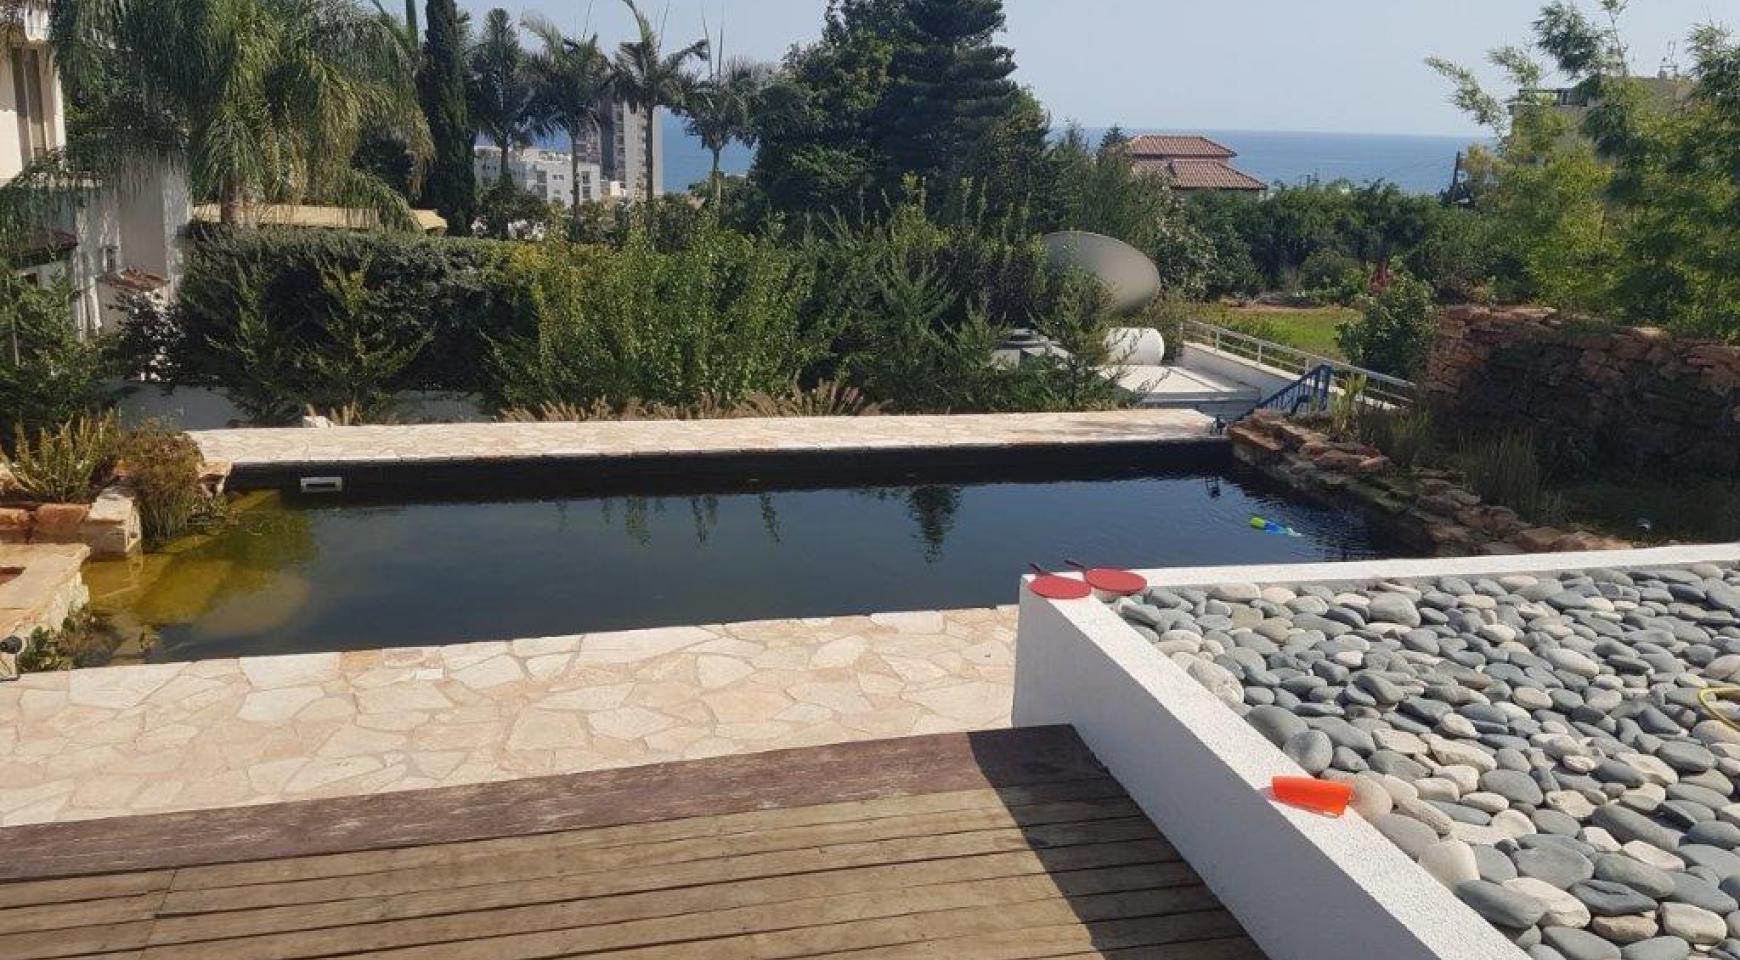 5-Спальная Вилла с видом на Море в районе  Agios Tychonas - 8